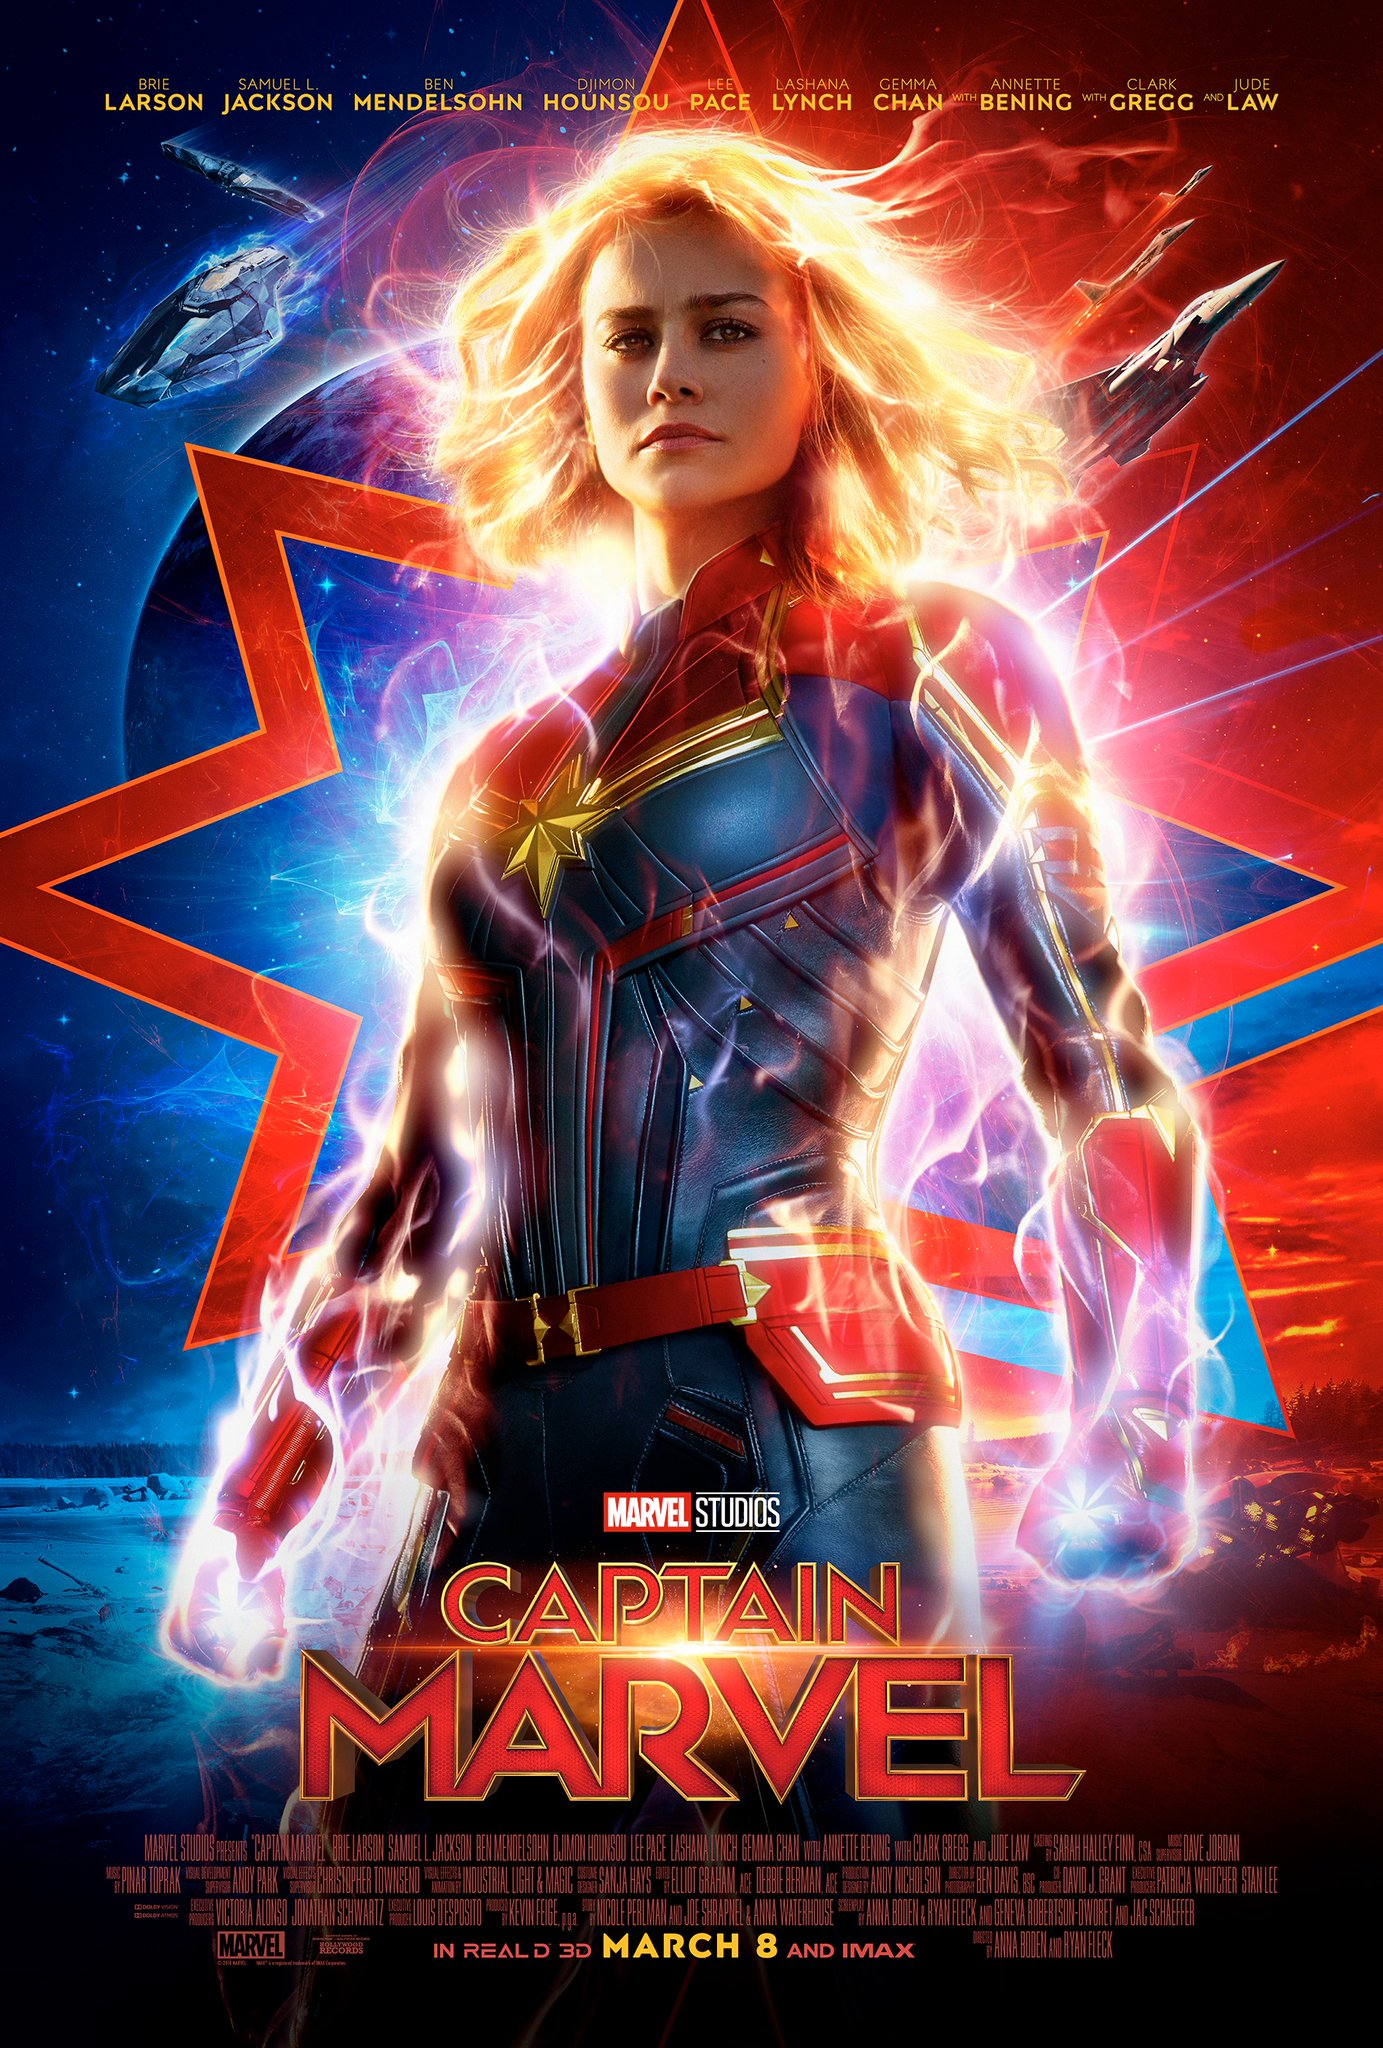 CaptainMarvel_poster_nuevo